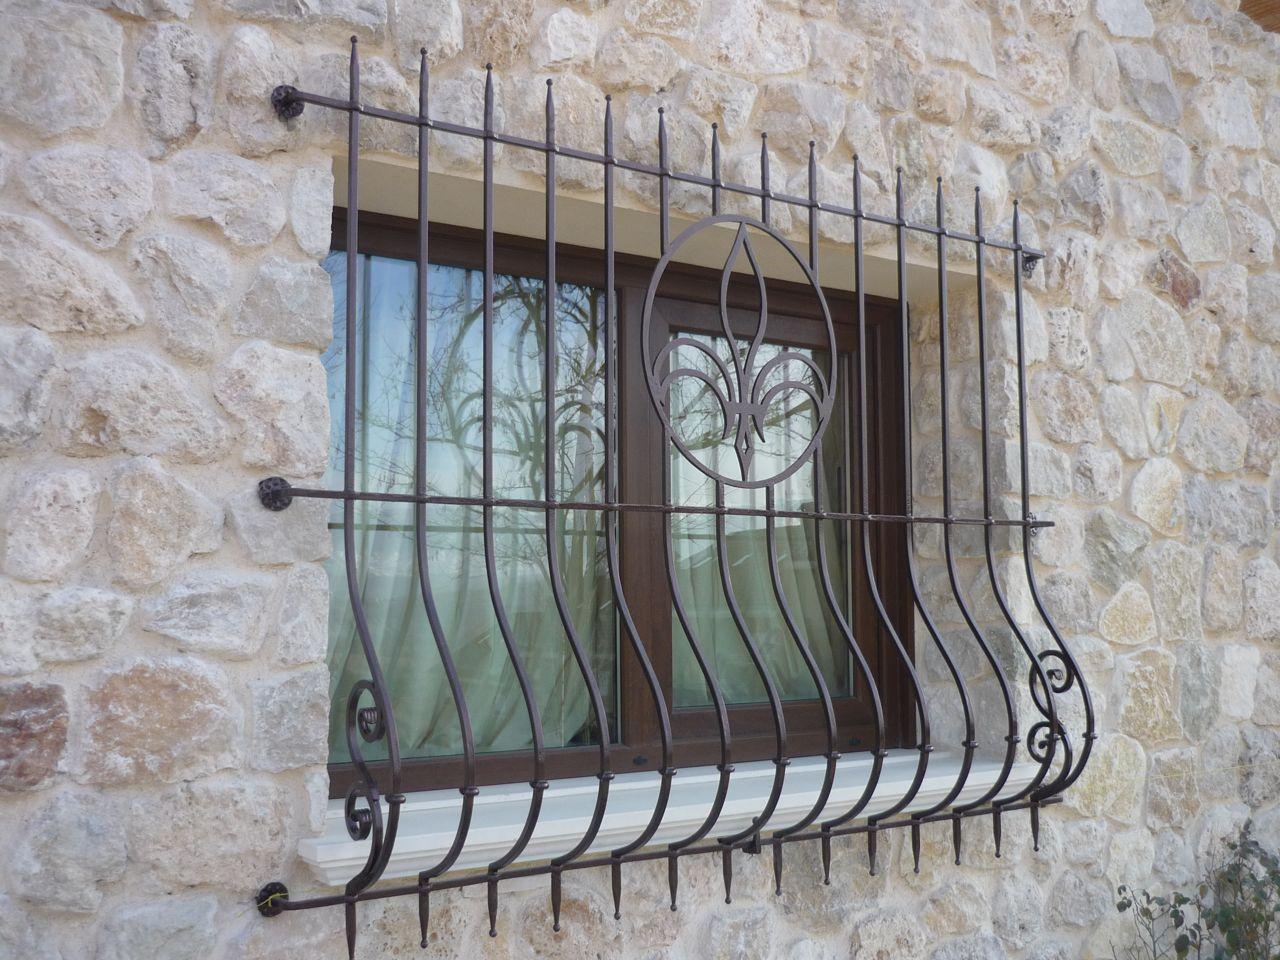 Grate e persiane di sicurezza faf di fulvi rolando figli - Disegni di grate per finestre ...